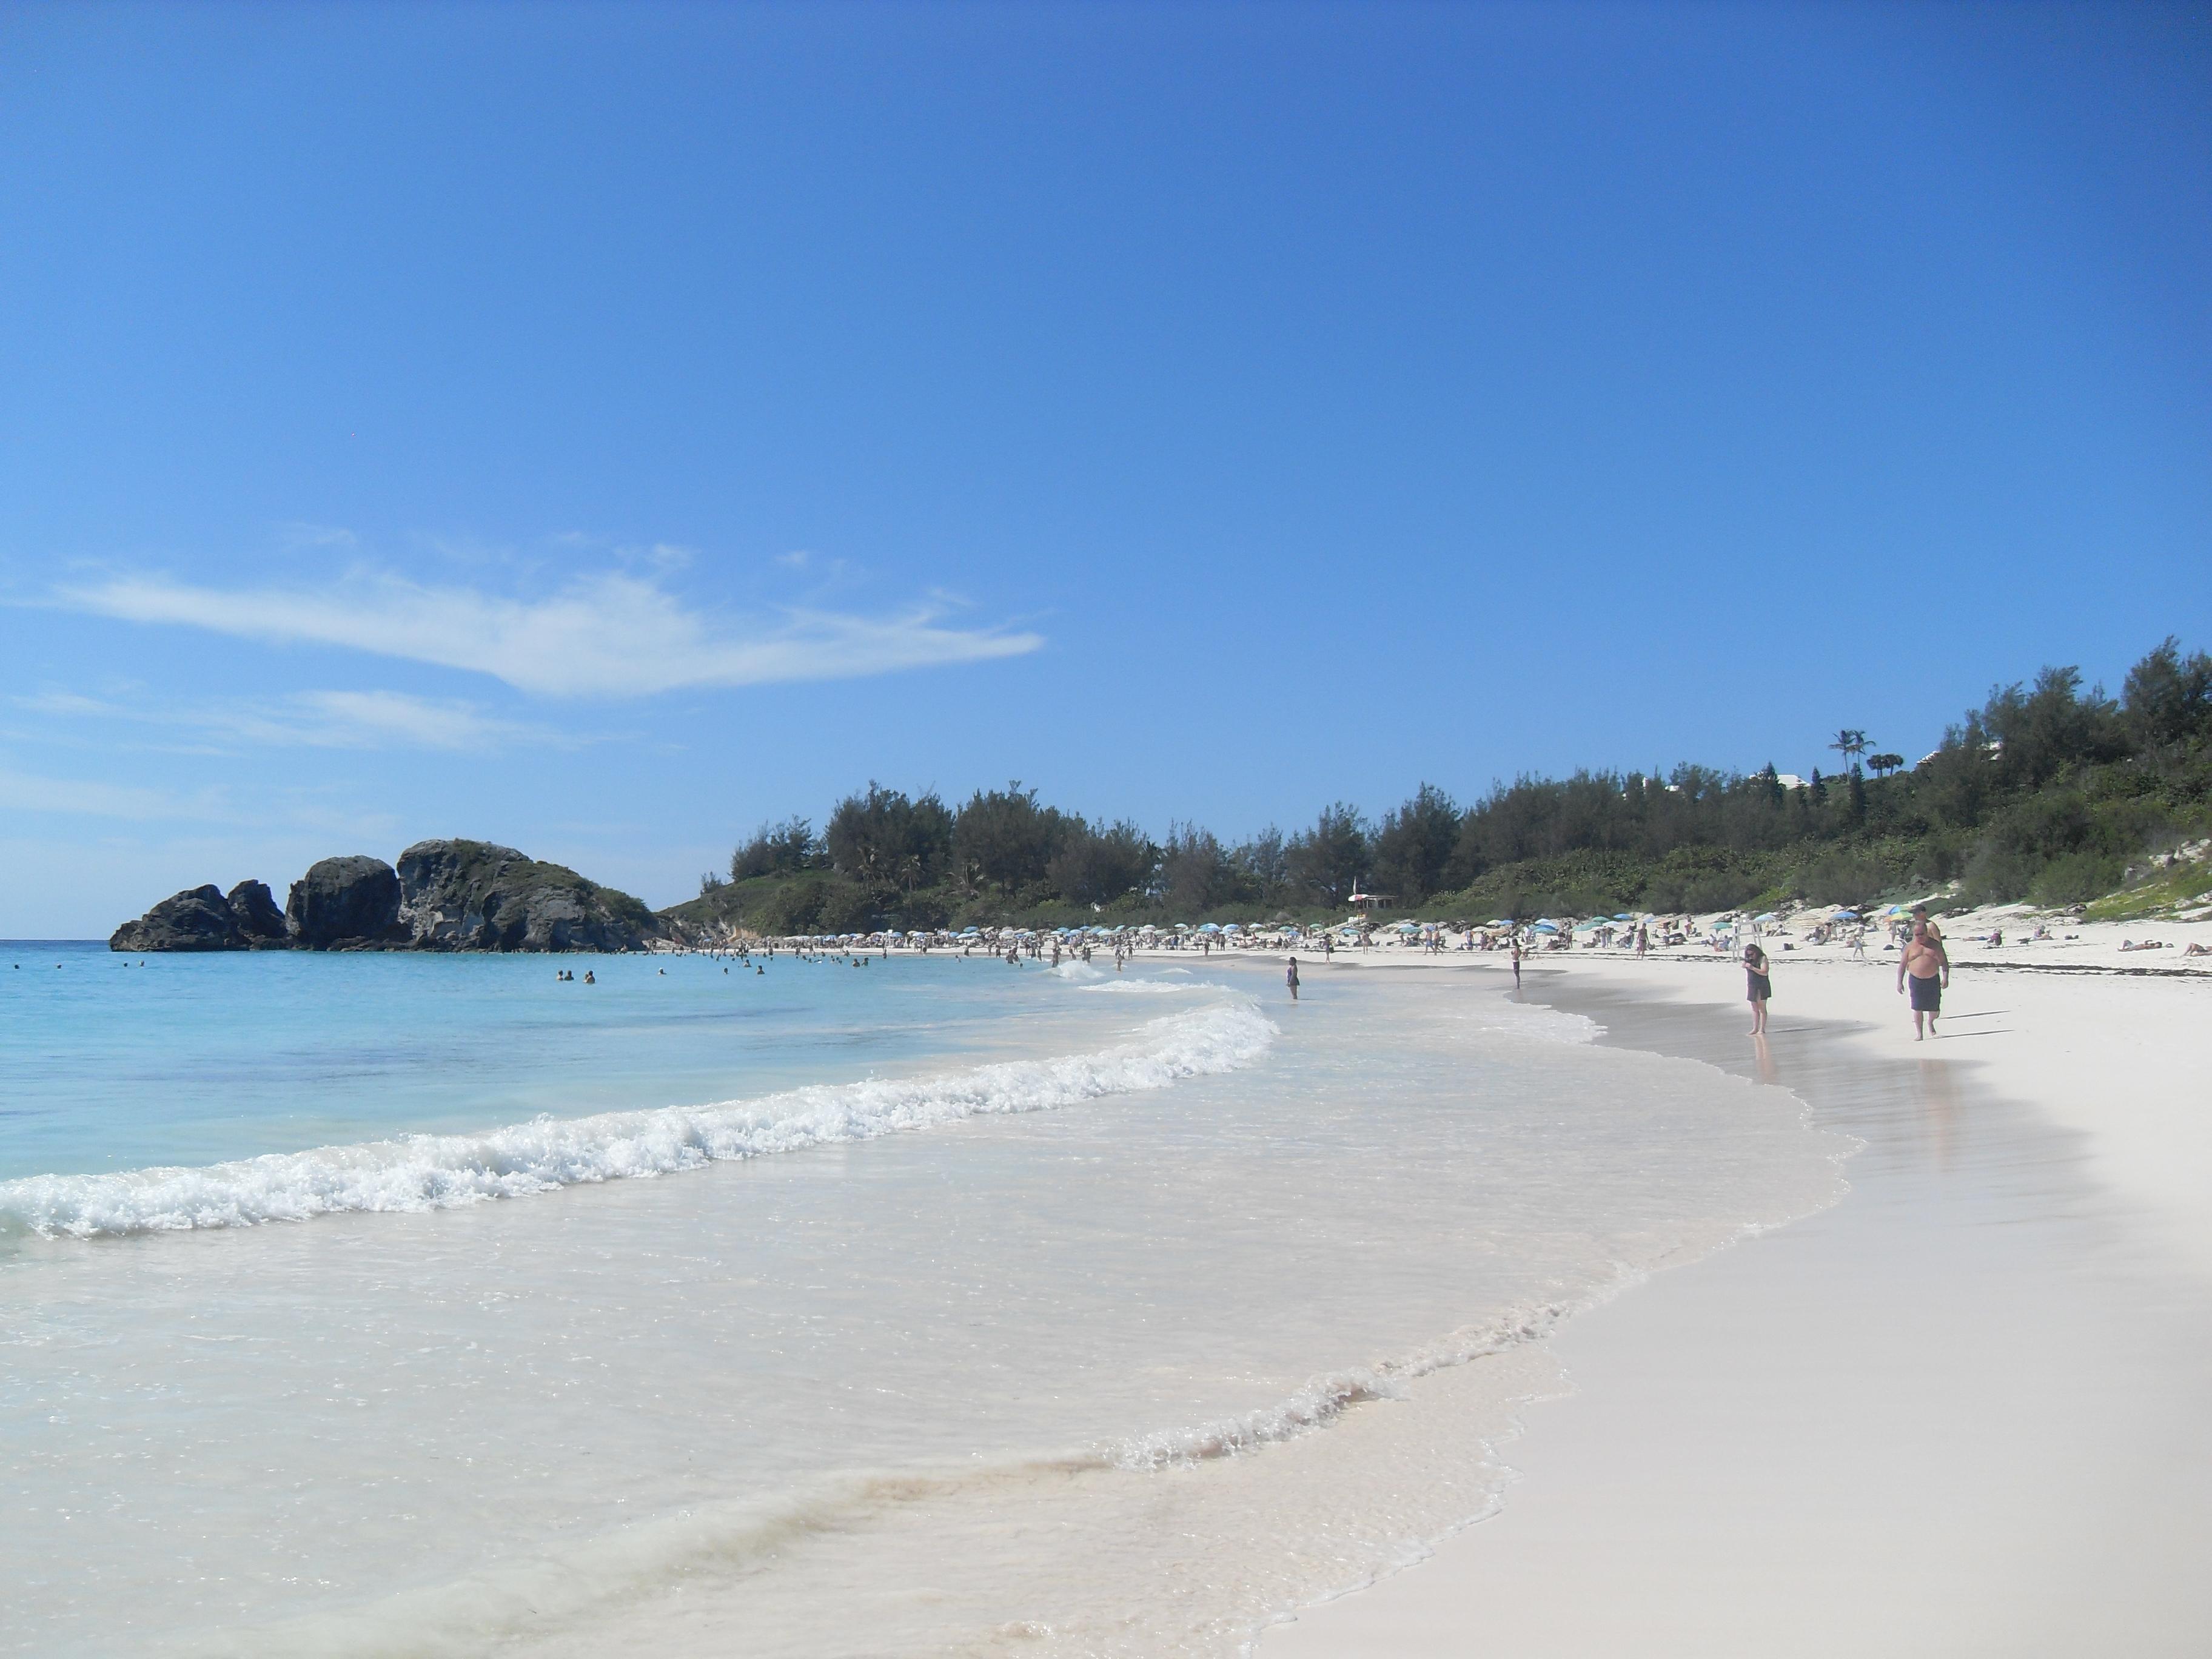 Horseshoe bay Bermuda wikimedia image